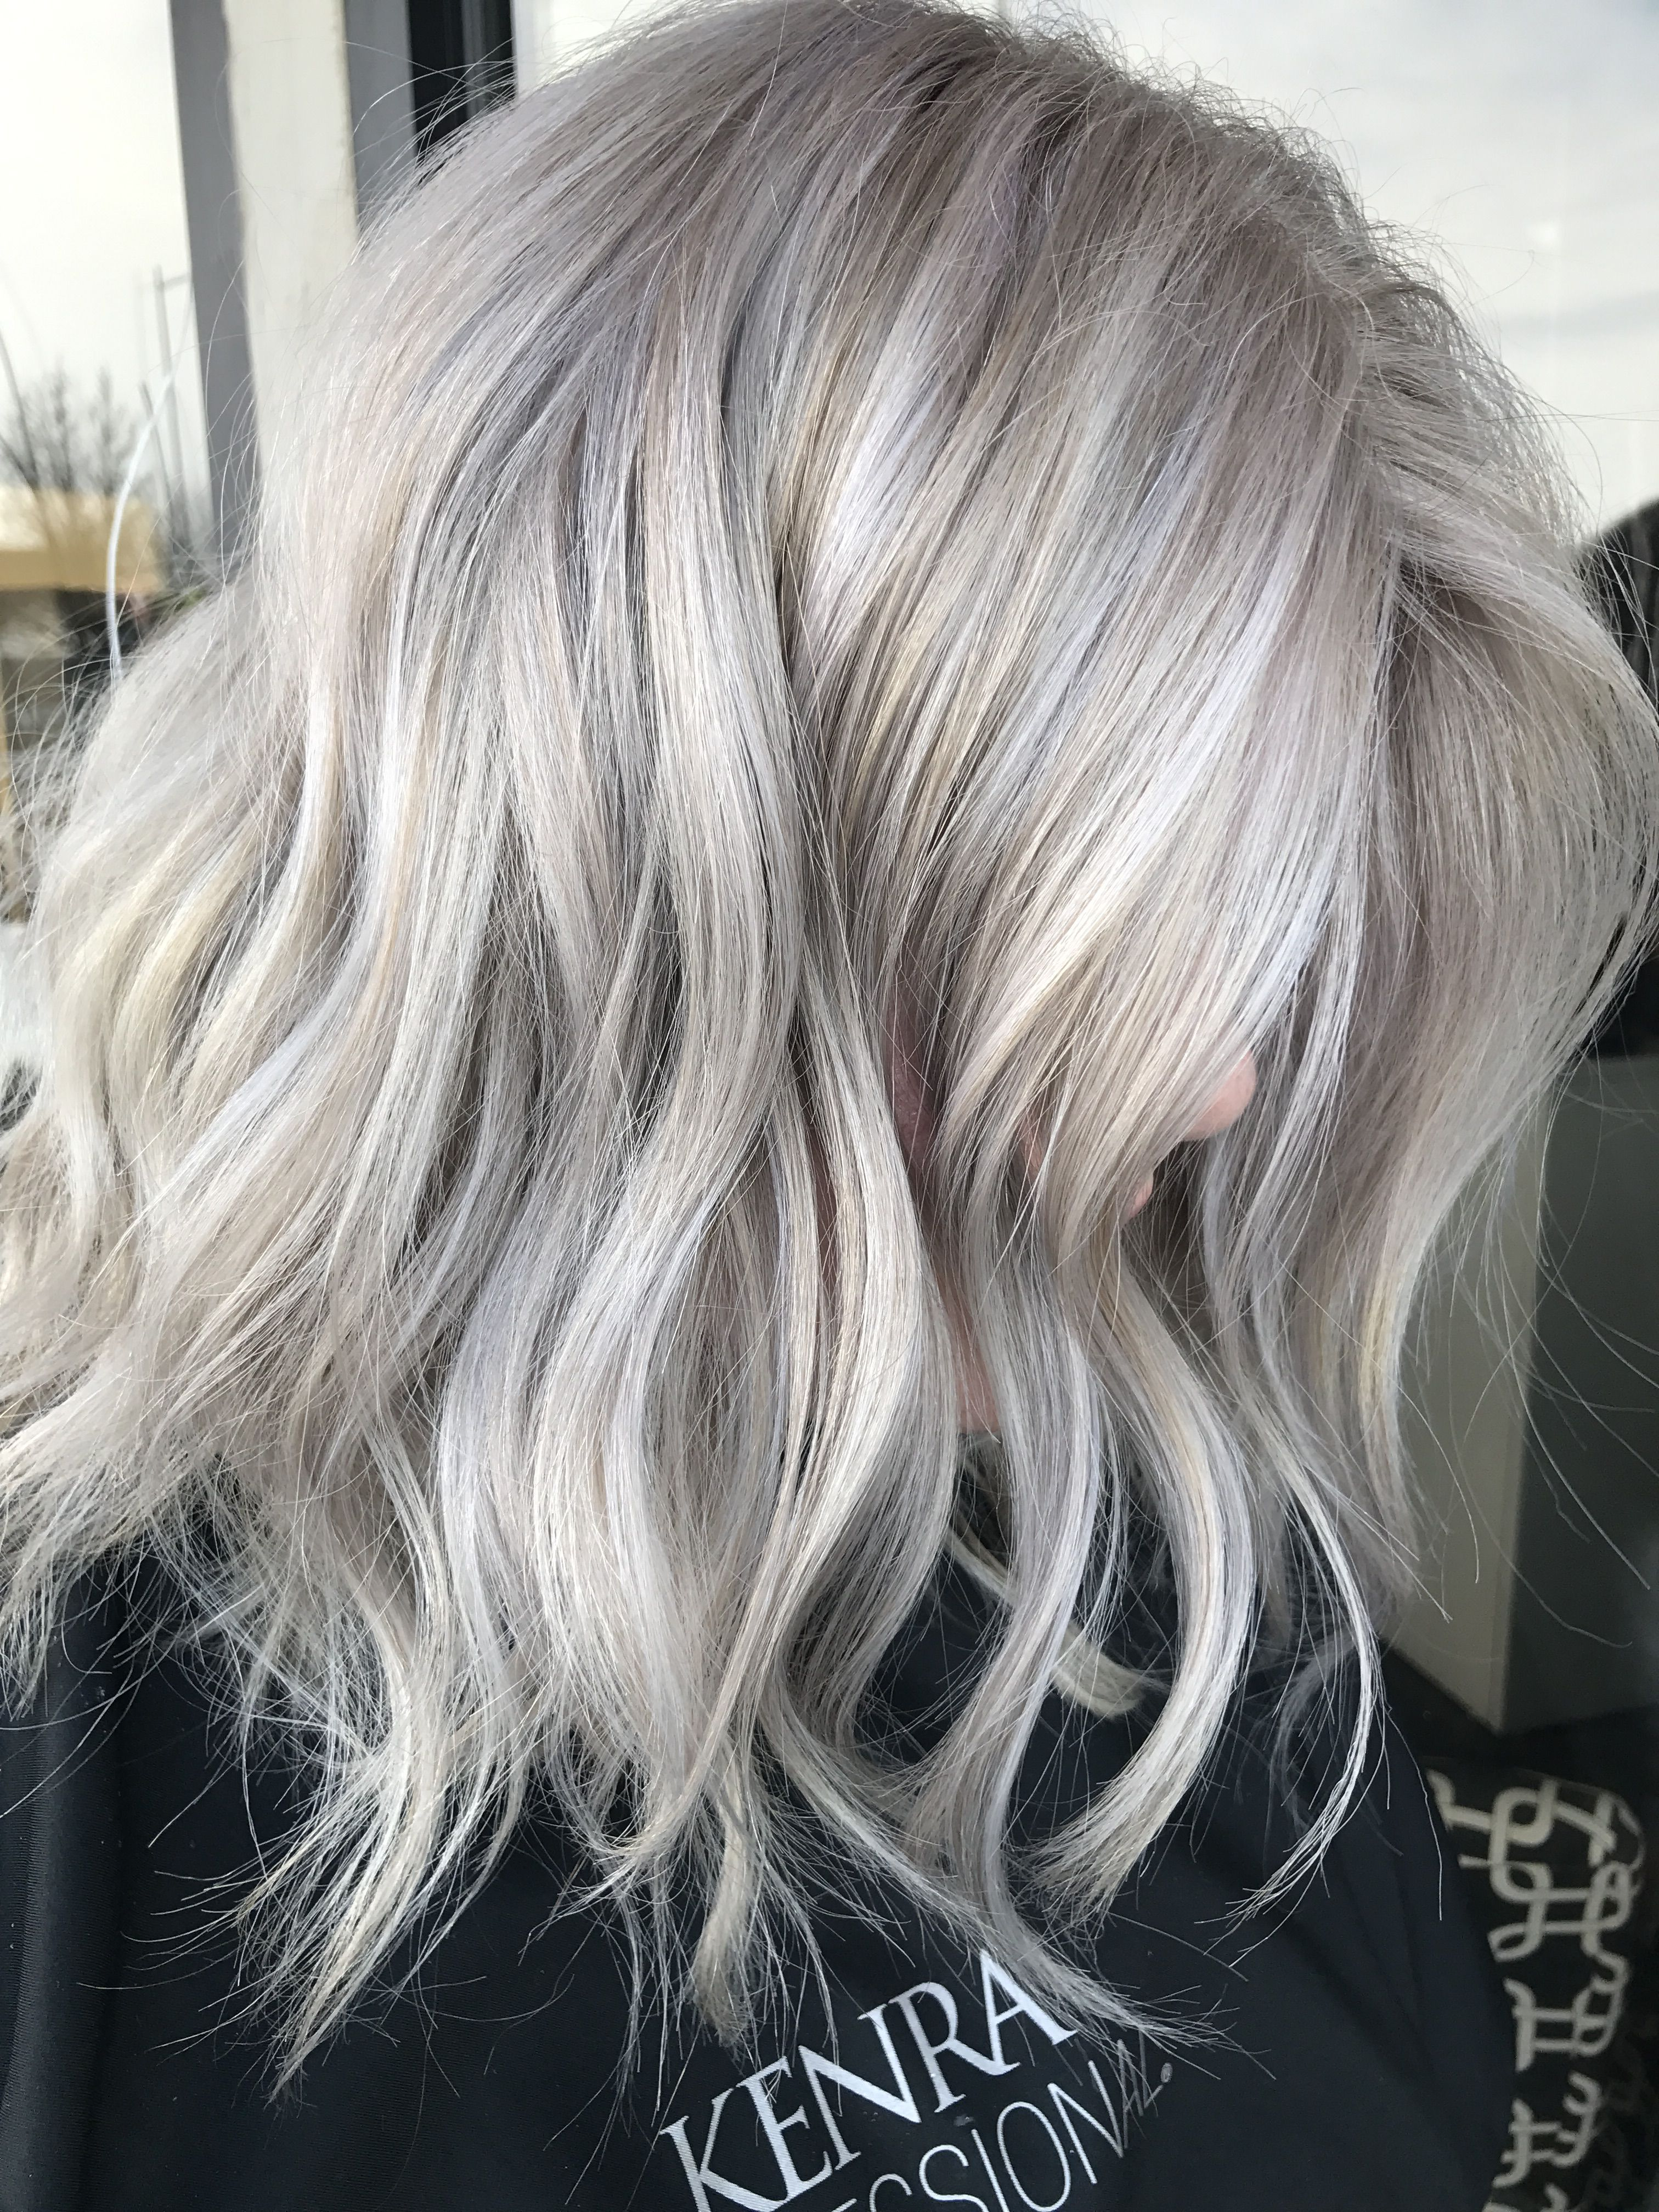 15 Atemberaubende Silberblond Haarfarbe Ideen Fur 2019 Frisuren